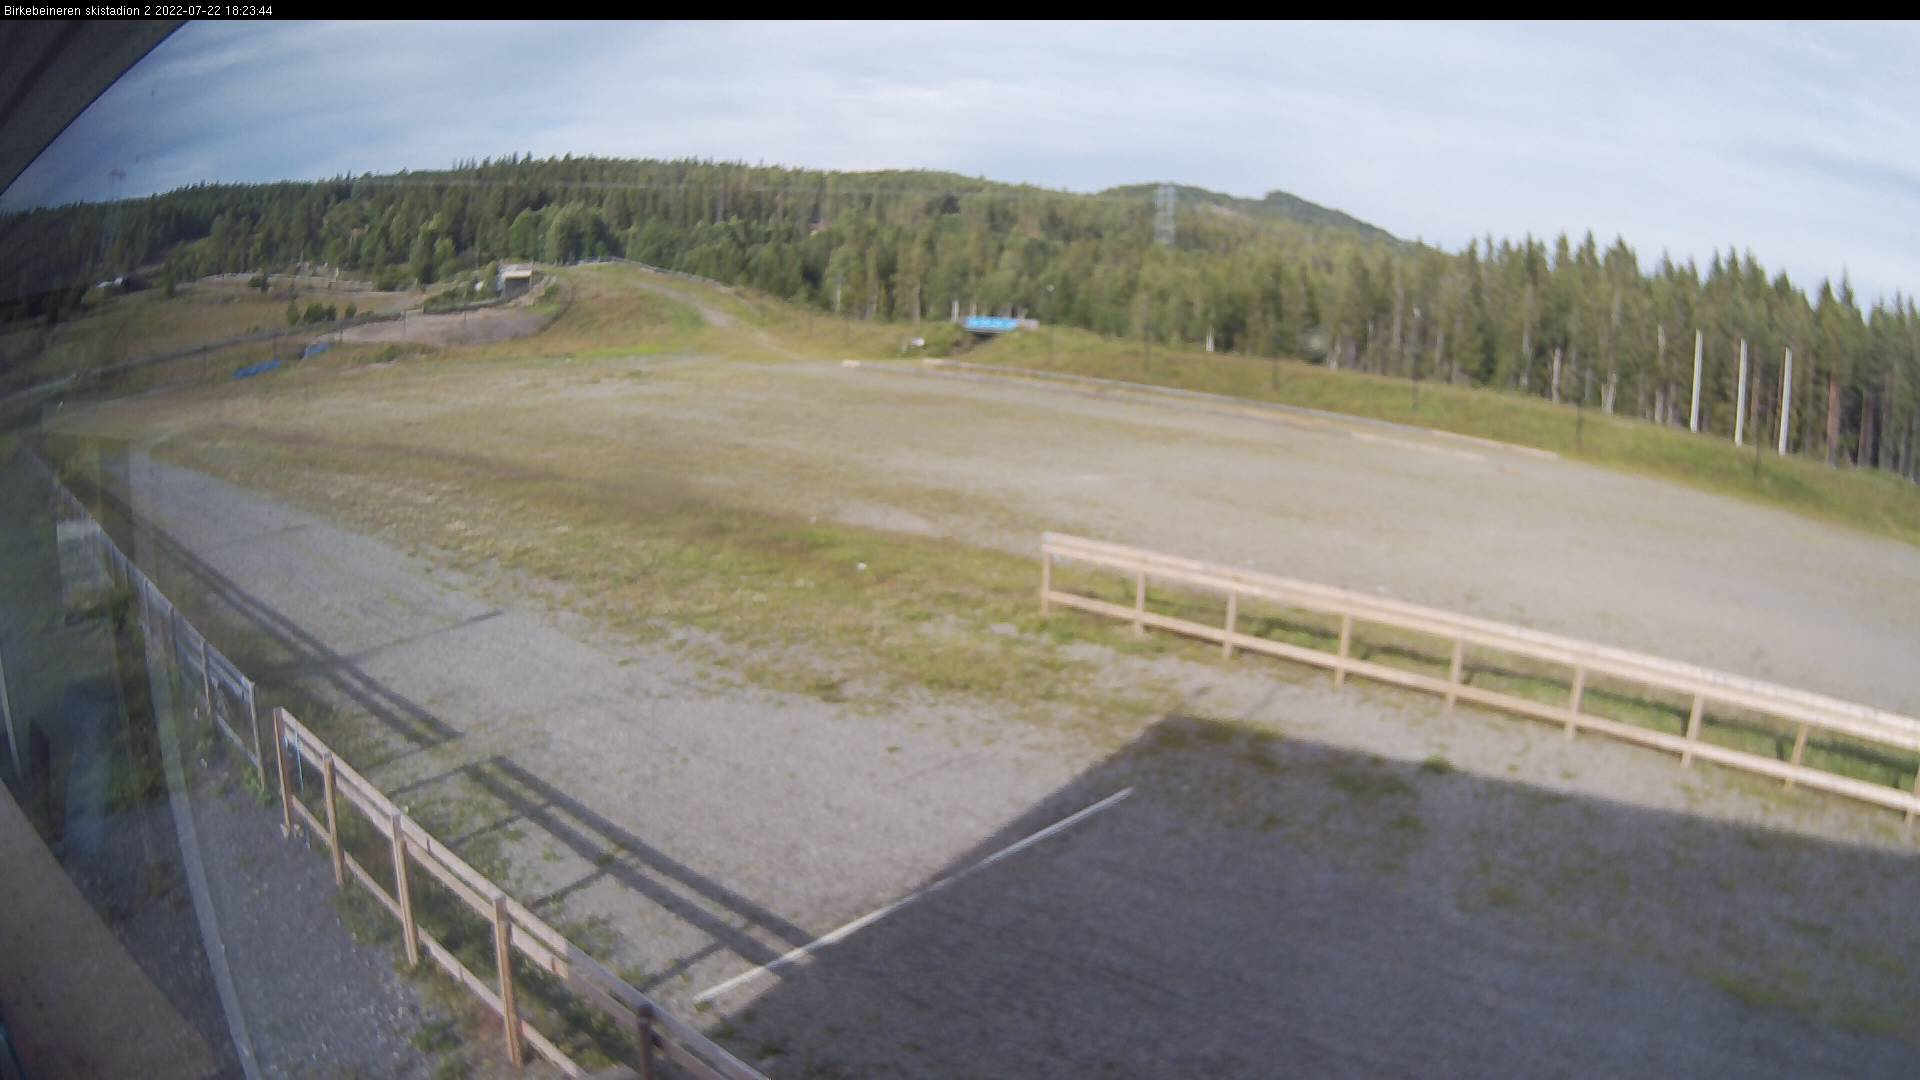 Birkebeiner WourldCup stadion